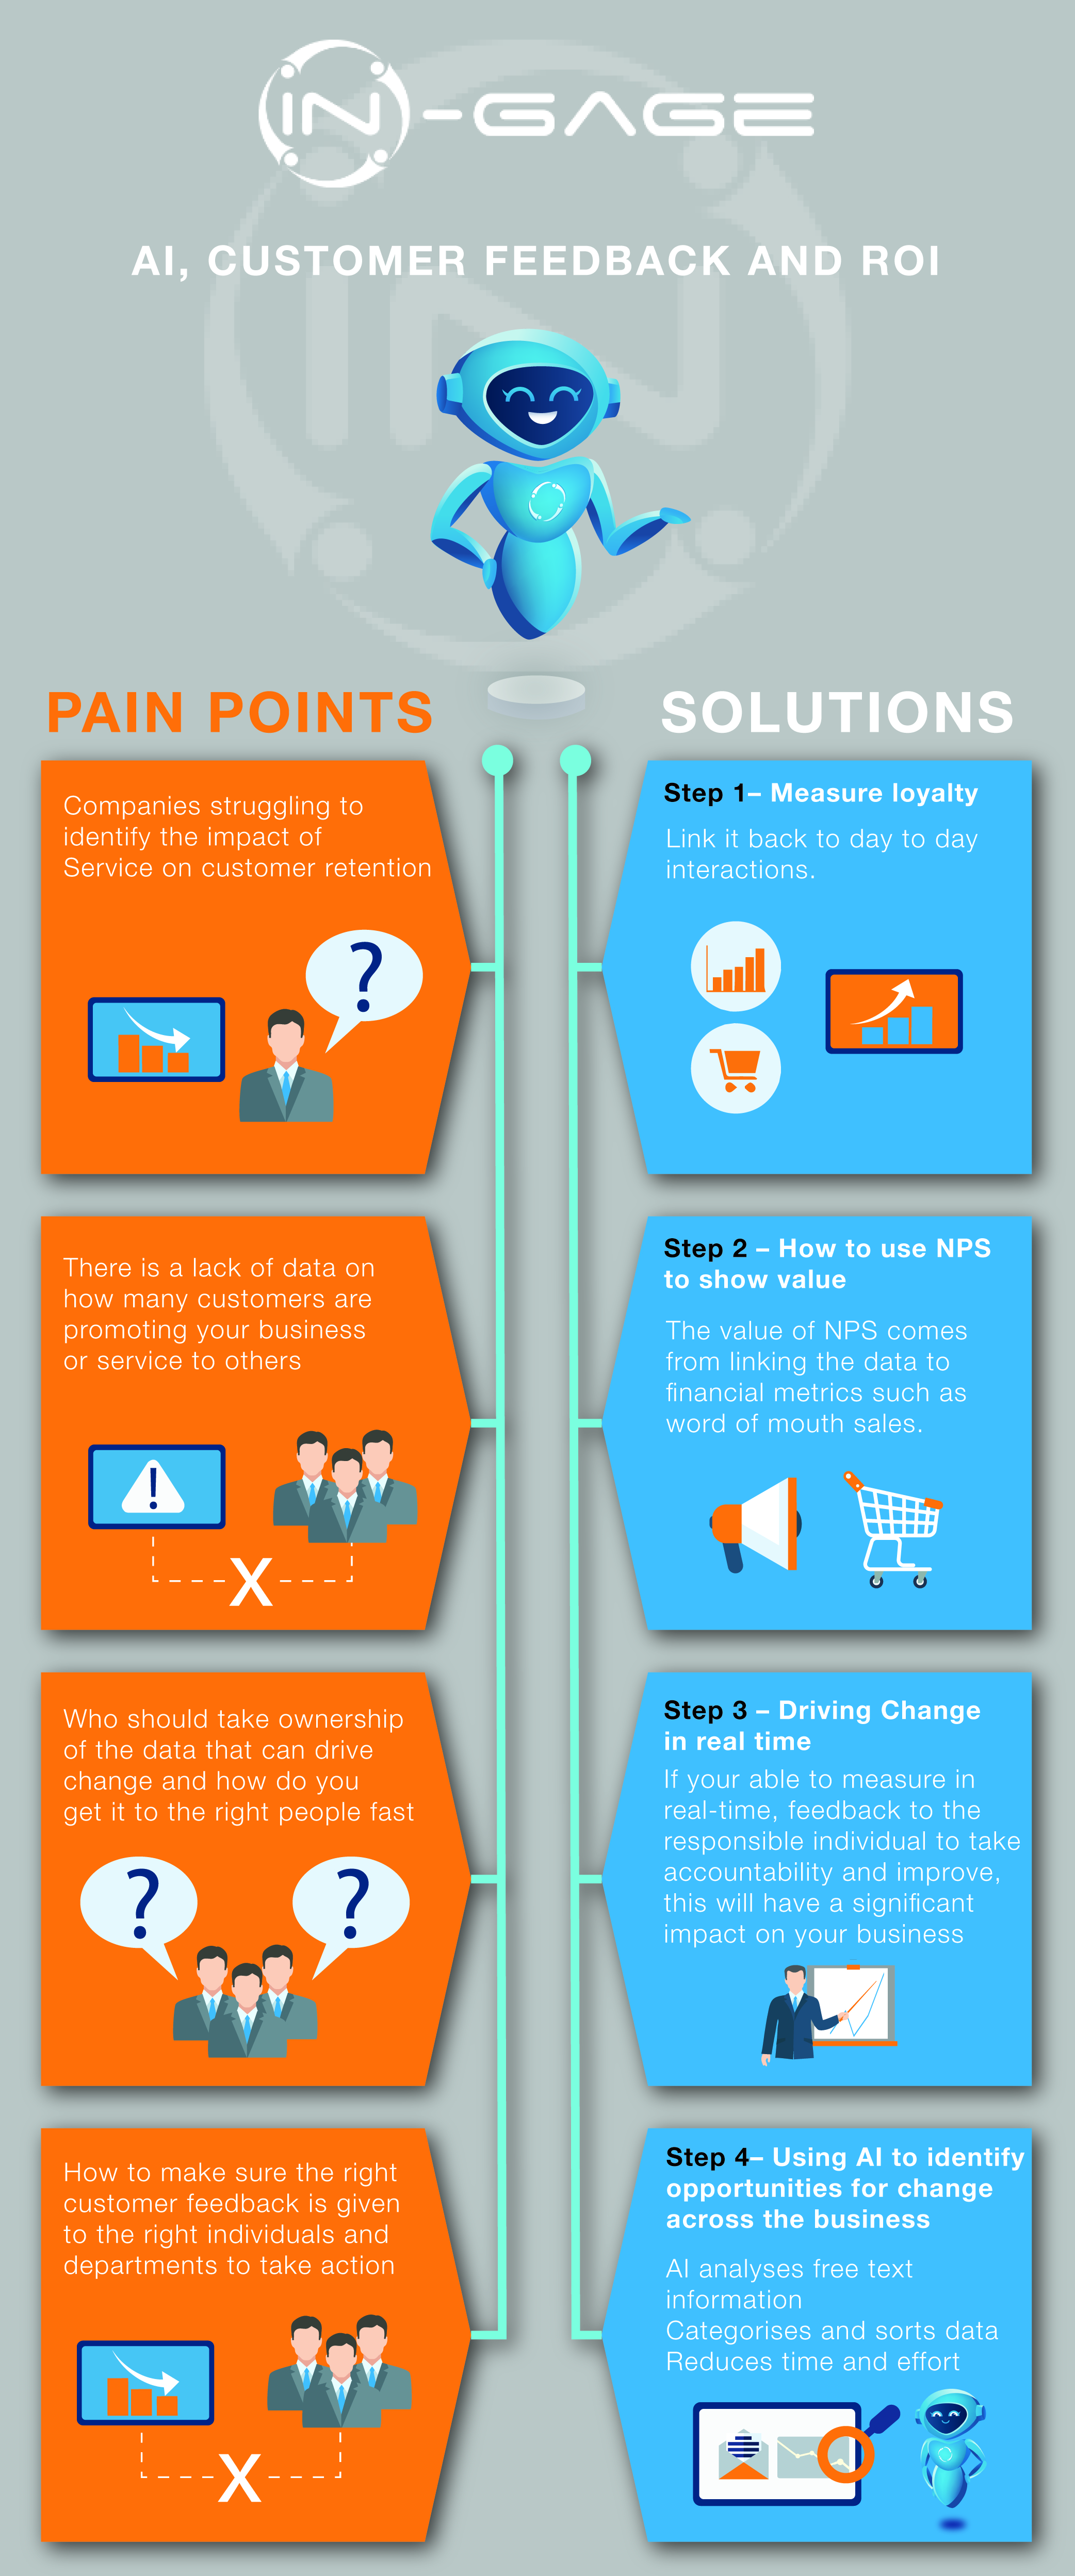 The 4 tips to Customer Feedback success